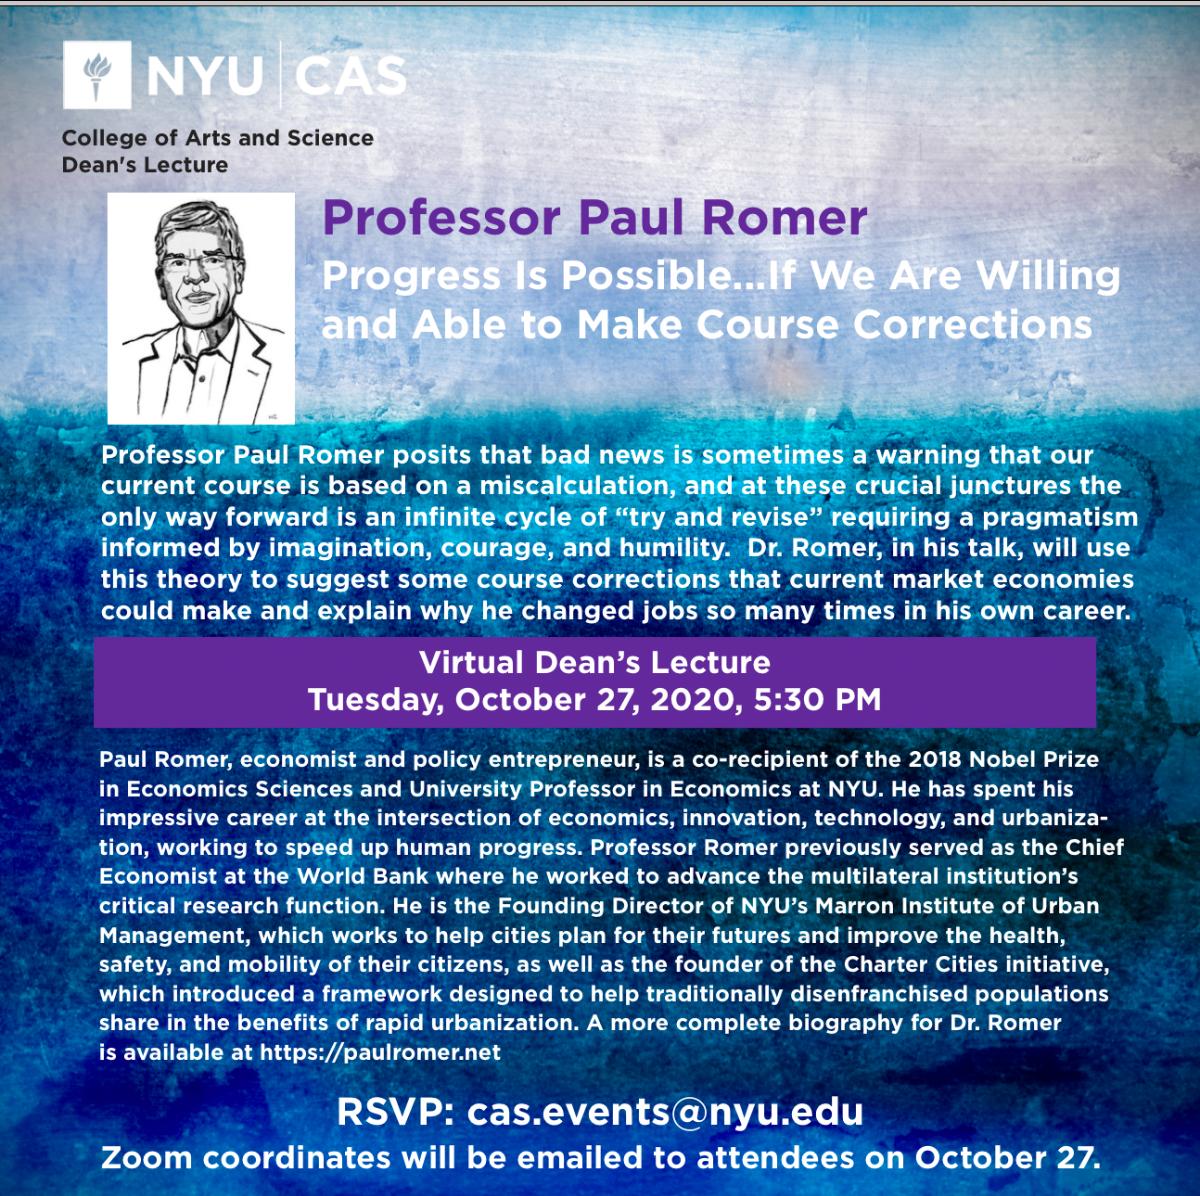 Professor Paul Romer Poster Photo